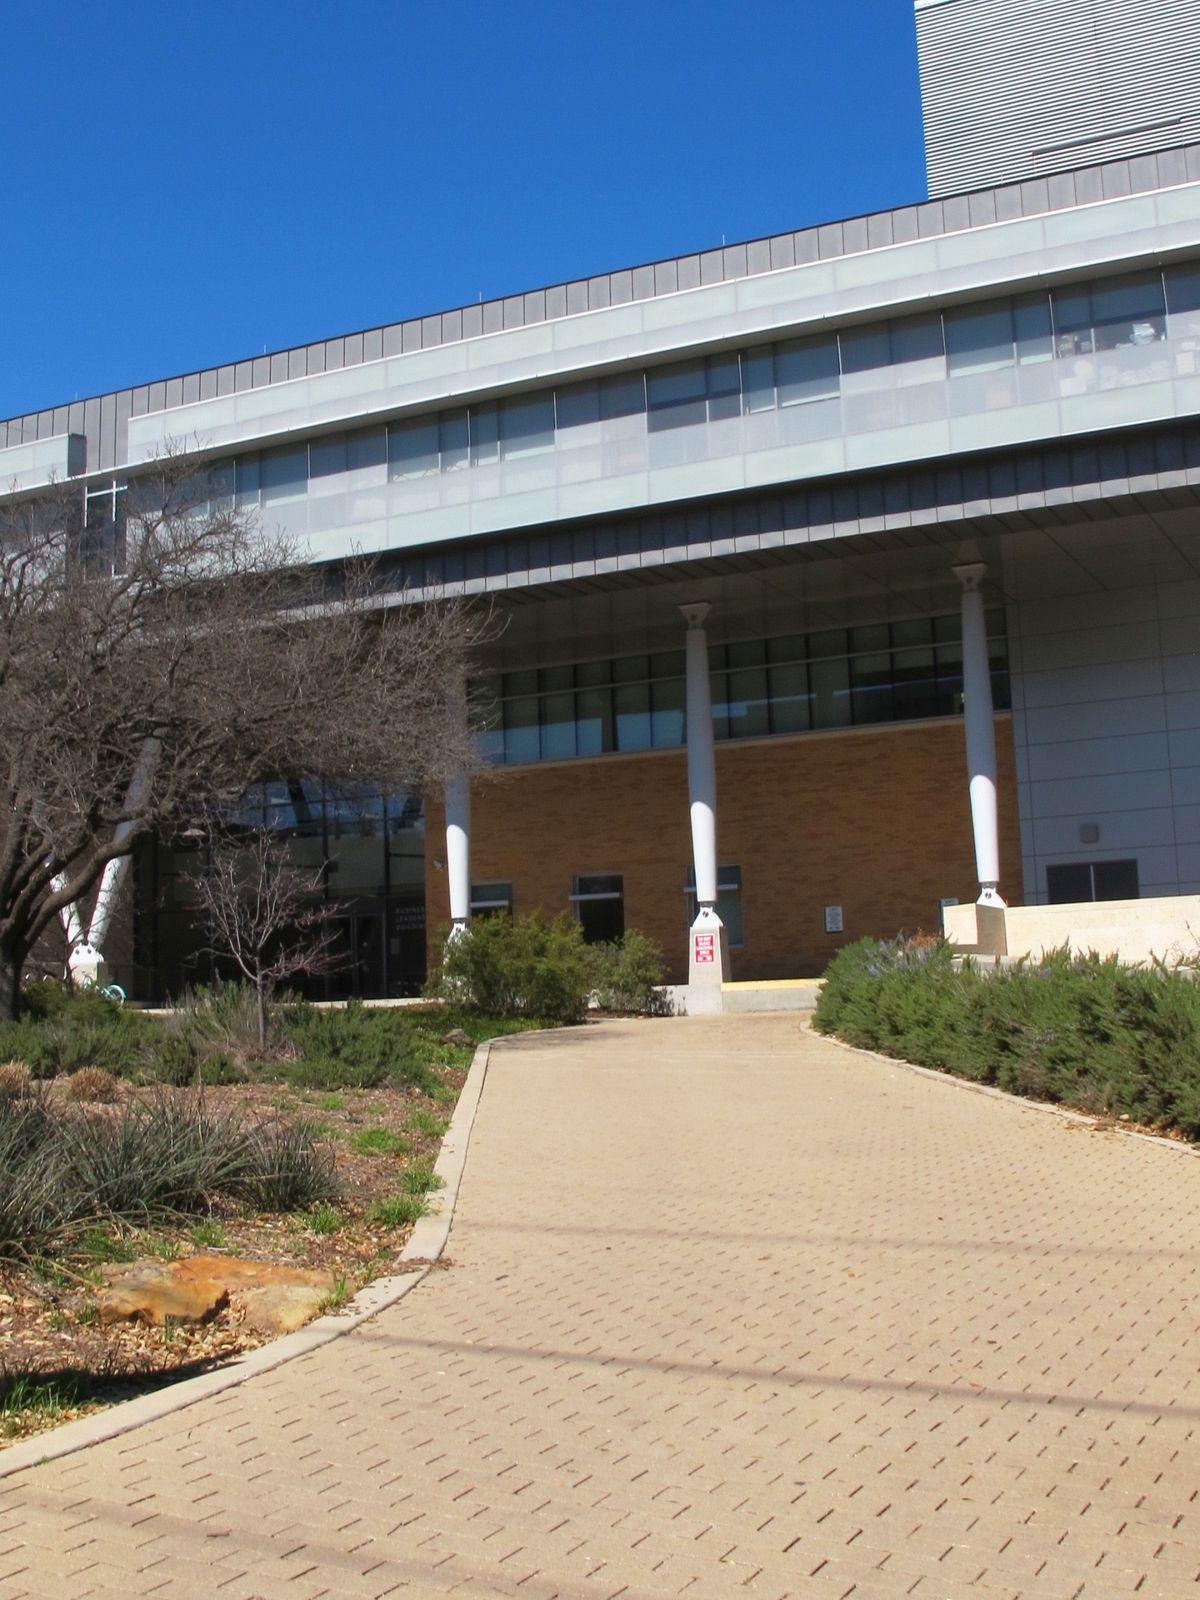 University of North Texas Schools Photo Video Shoot Location22.jpg